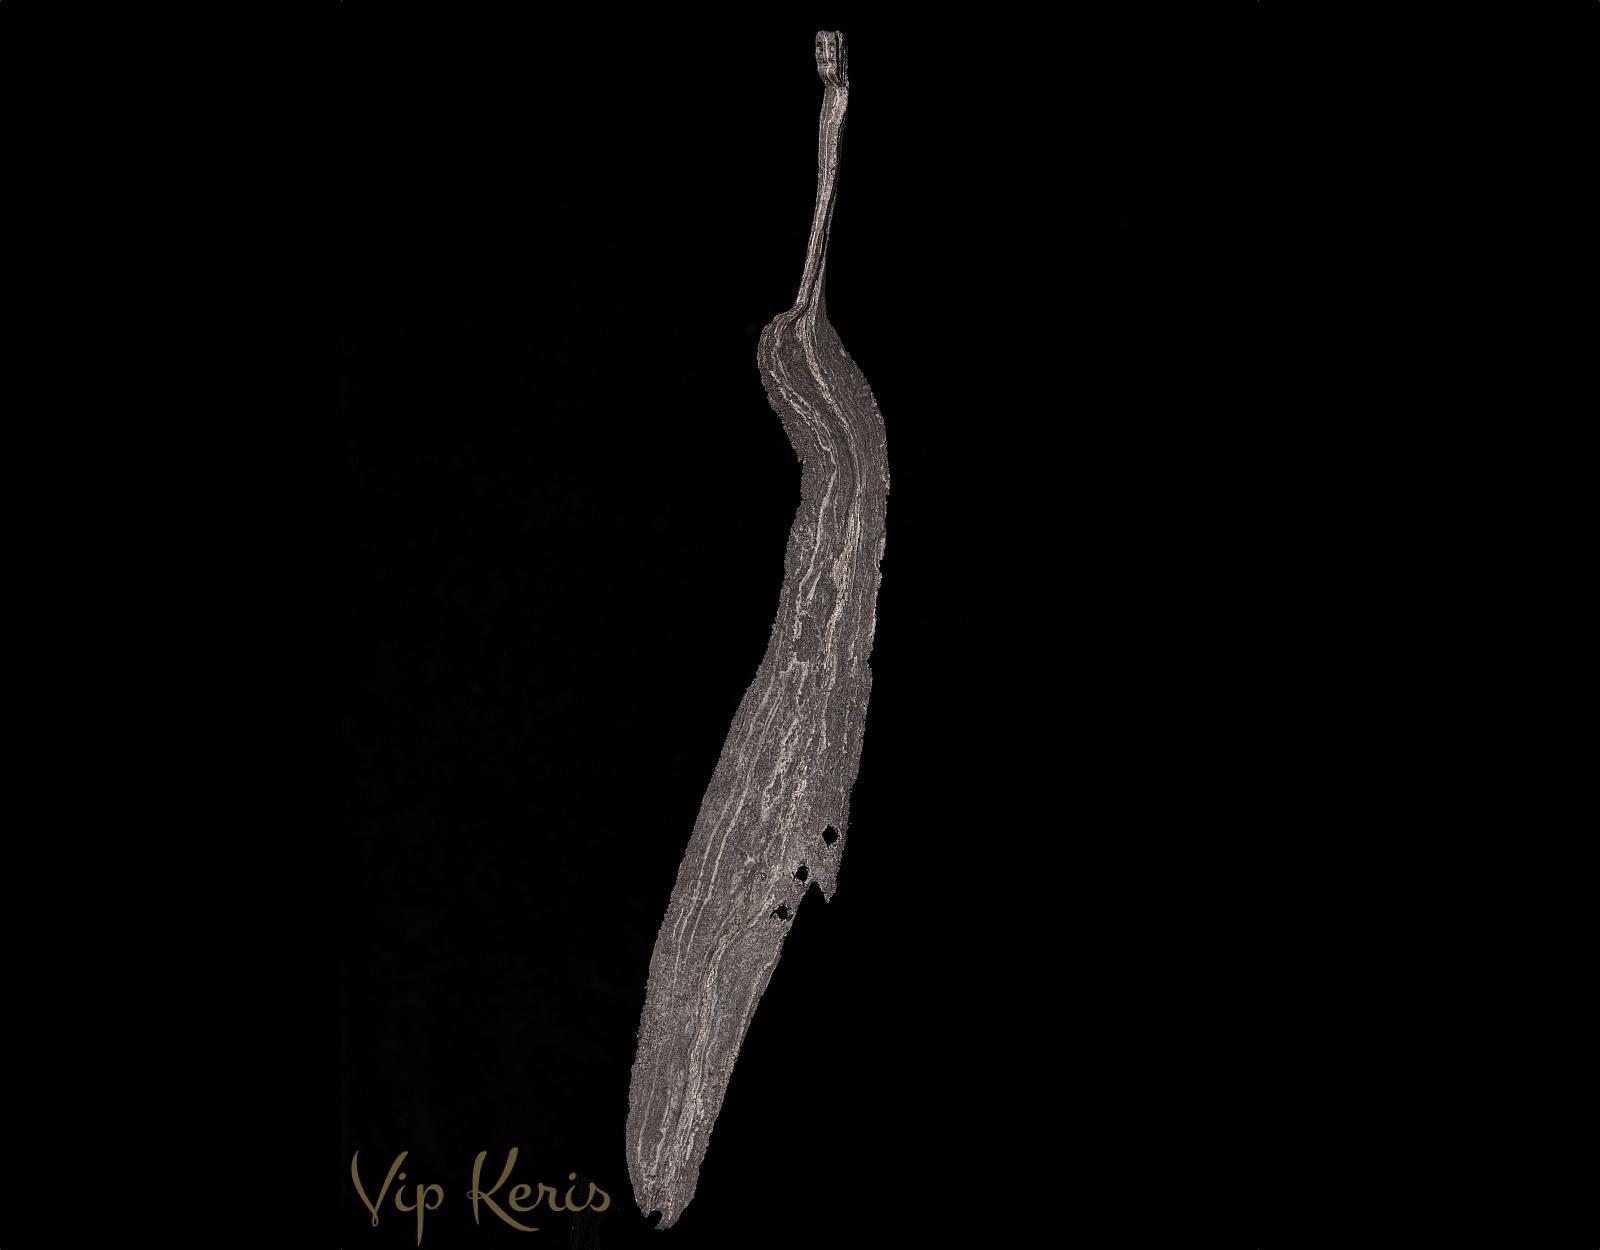 Ритуальный Крис Sajen Kudi фото VipKeris